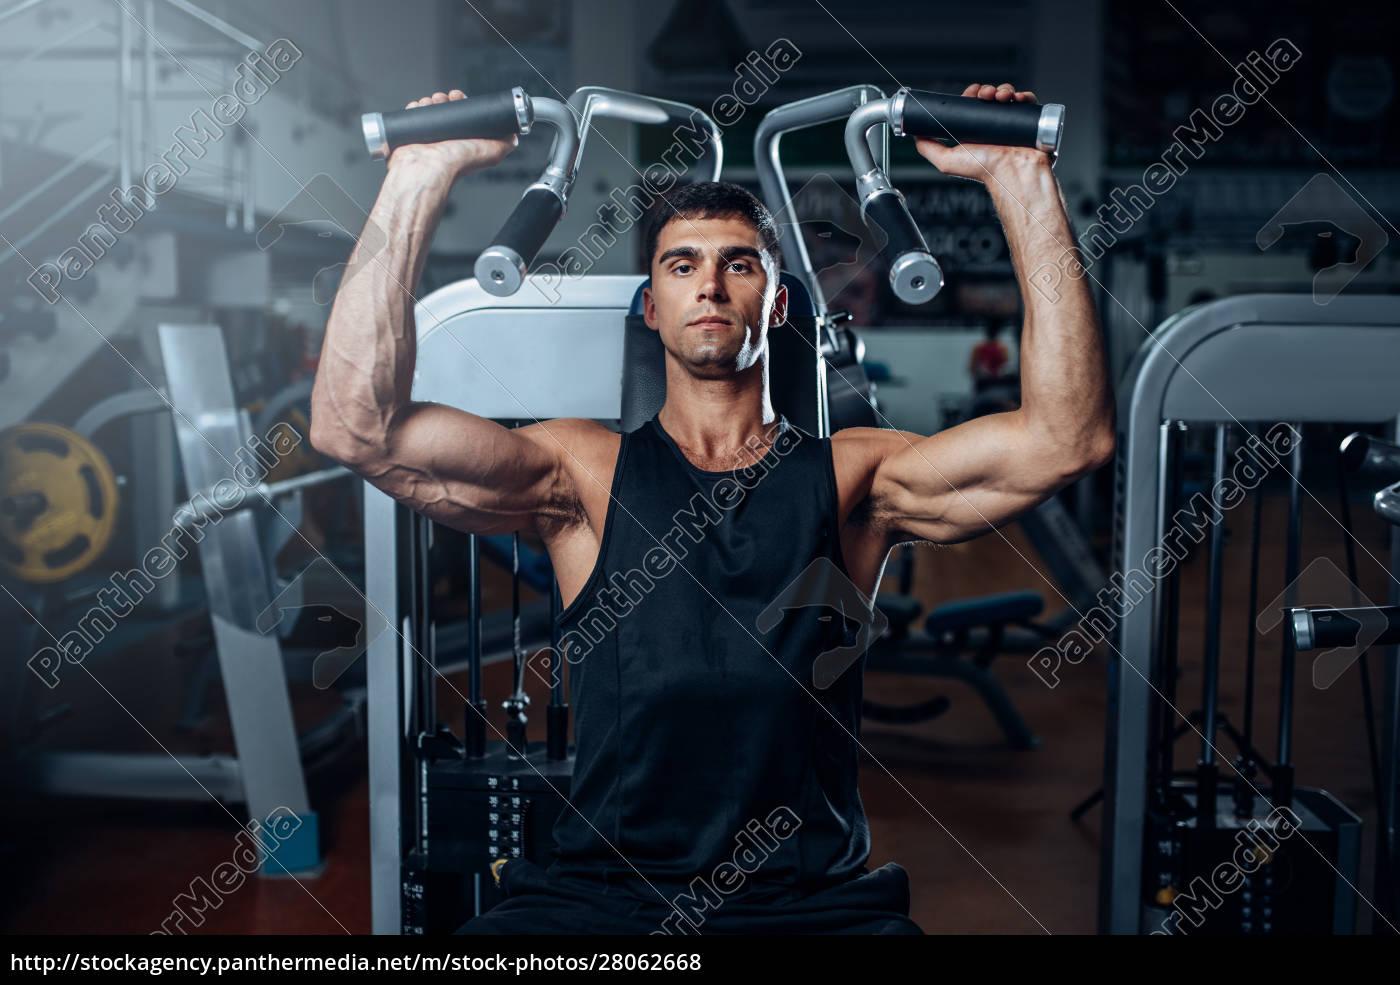 tanned, man, training, on, exercise, machine - 28062668